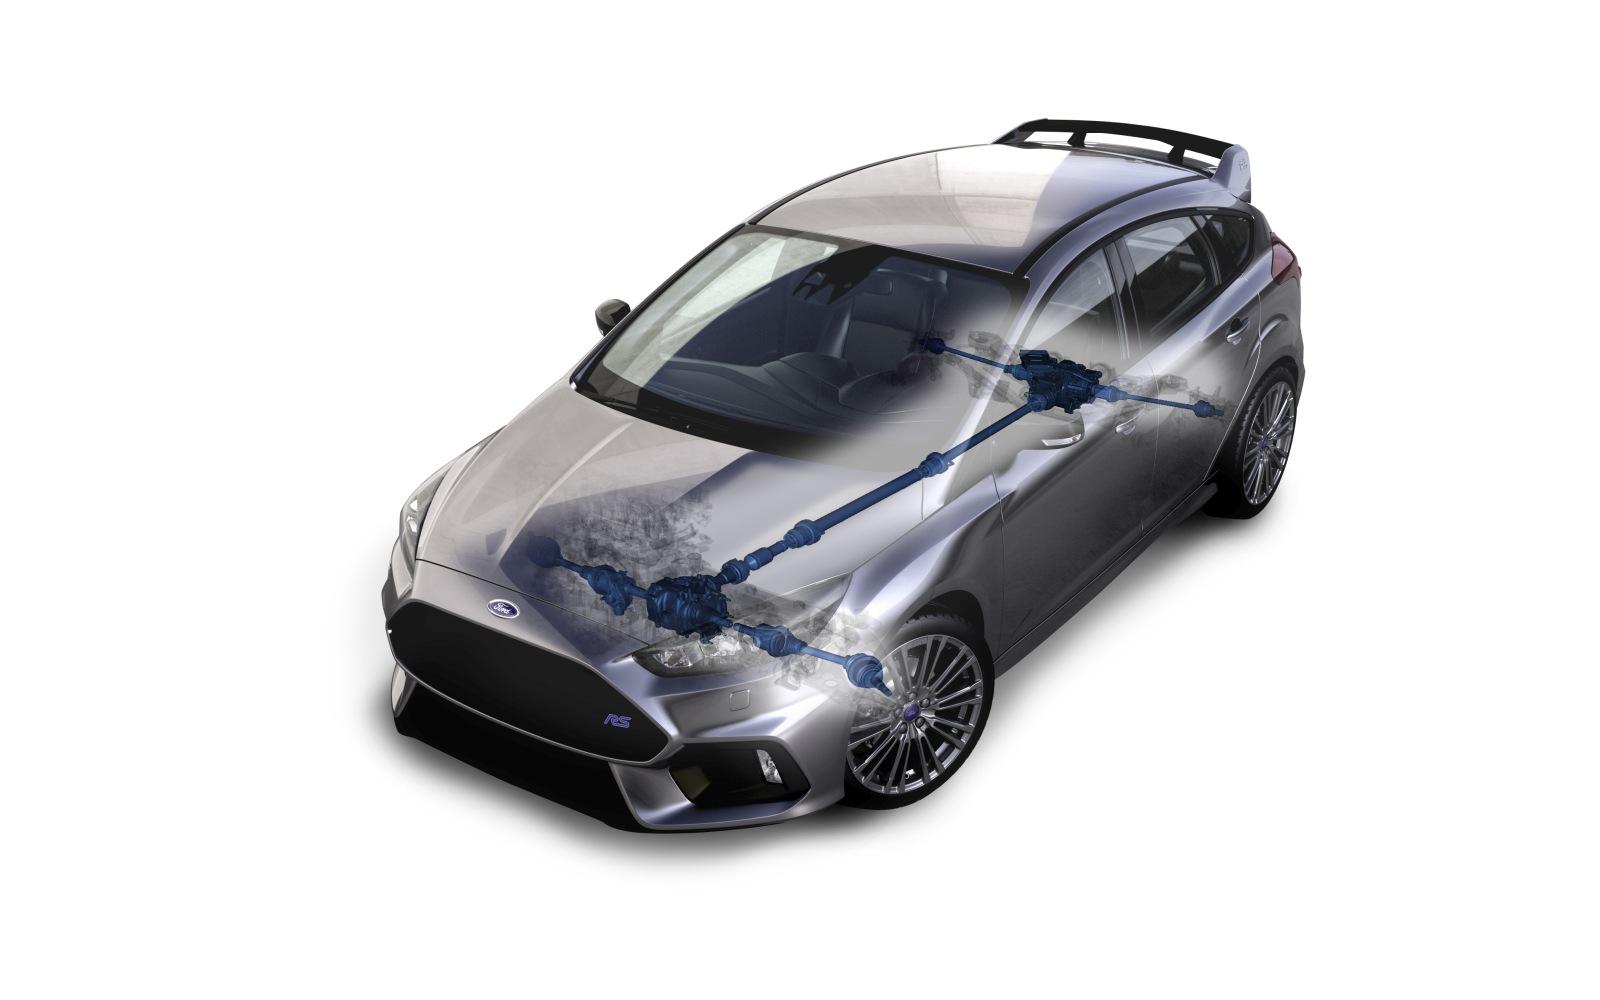 2015 Ford Focus RS Torque Vectoring Differentials